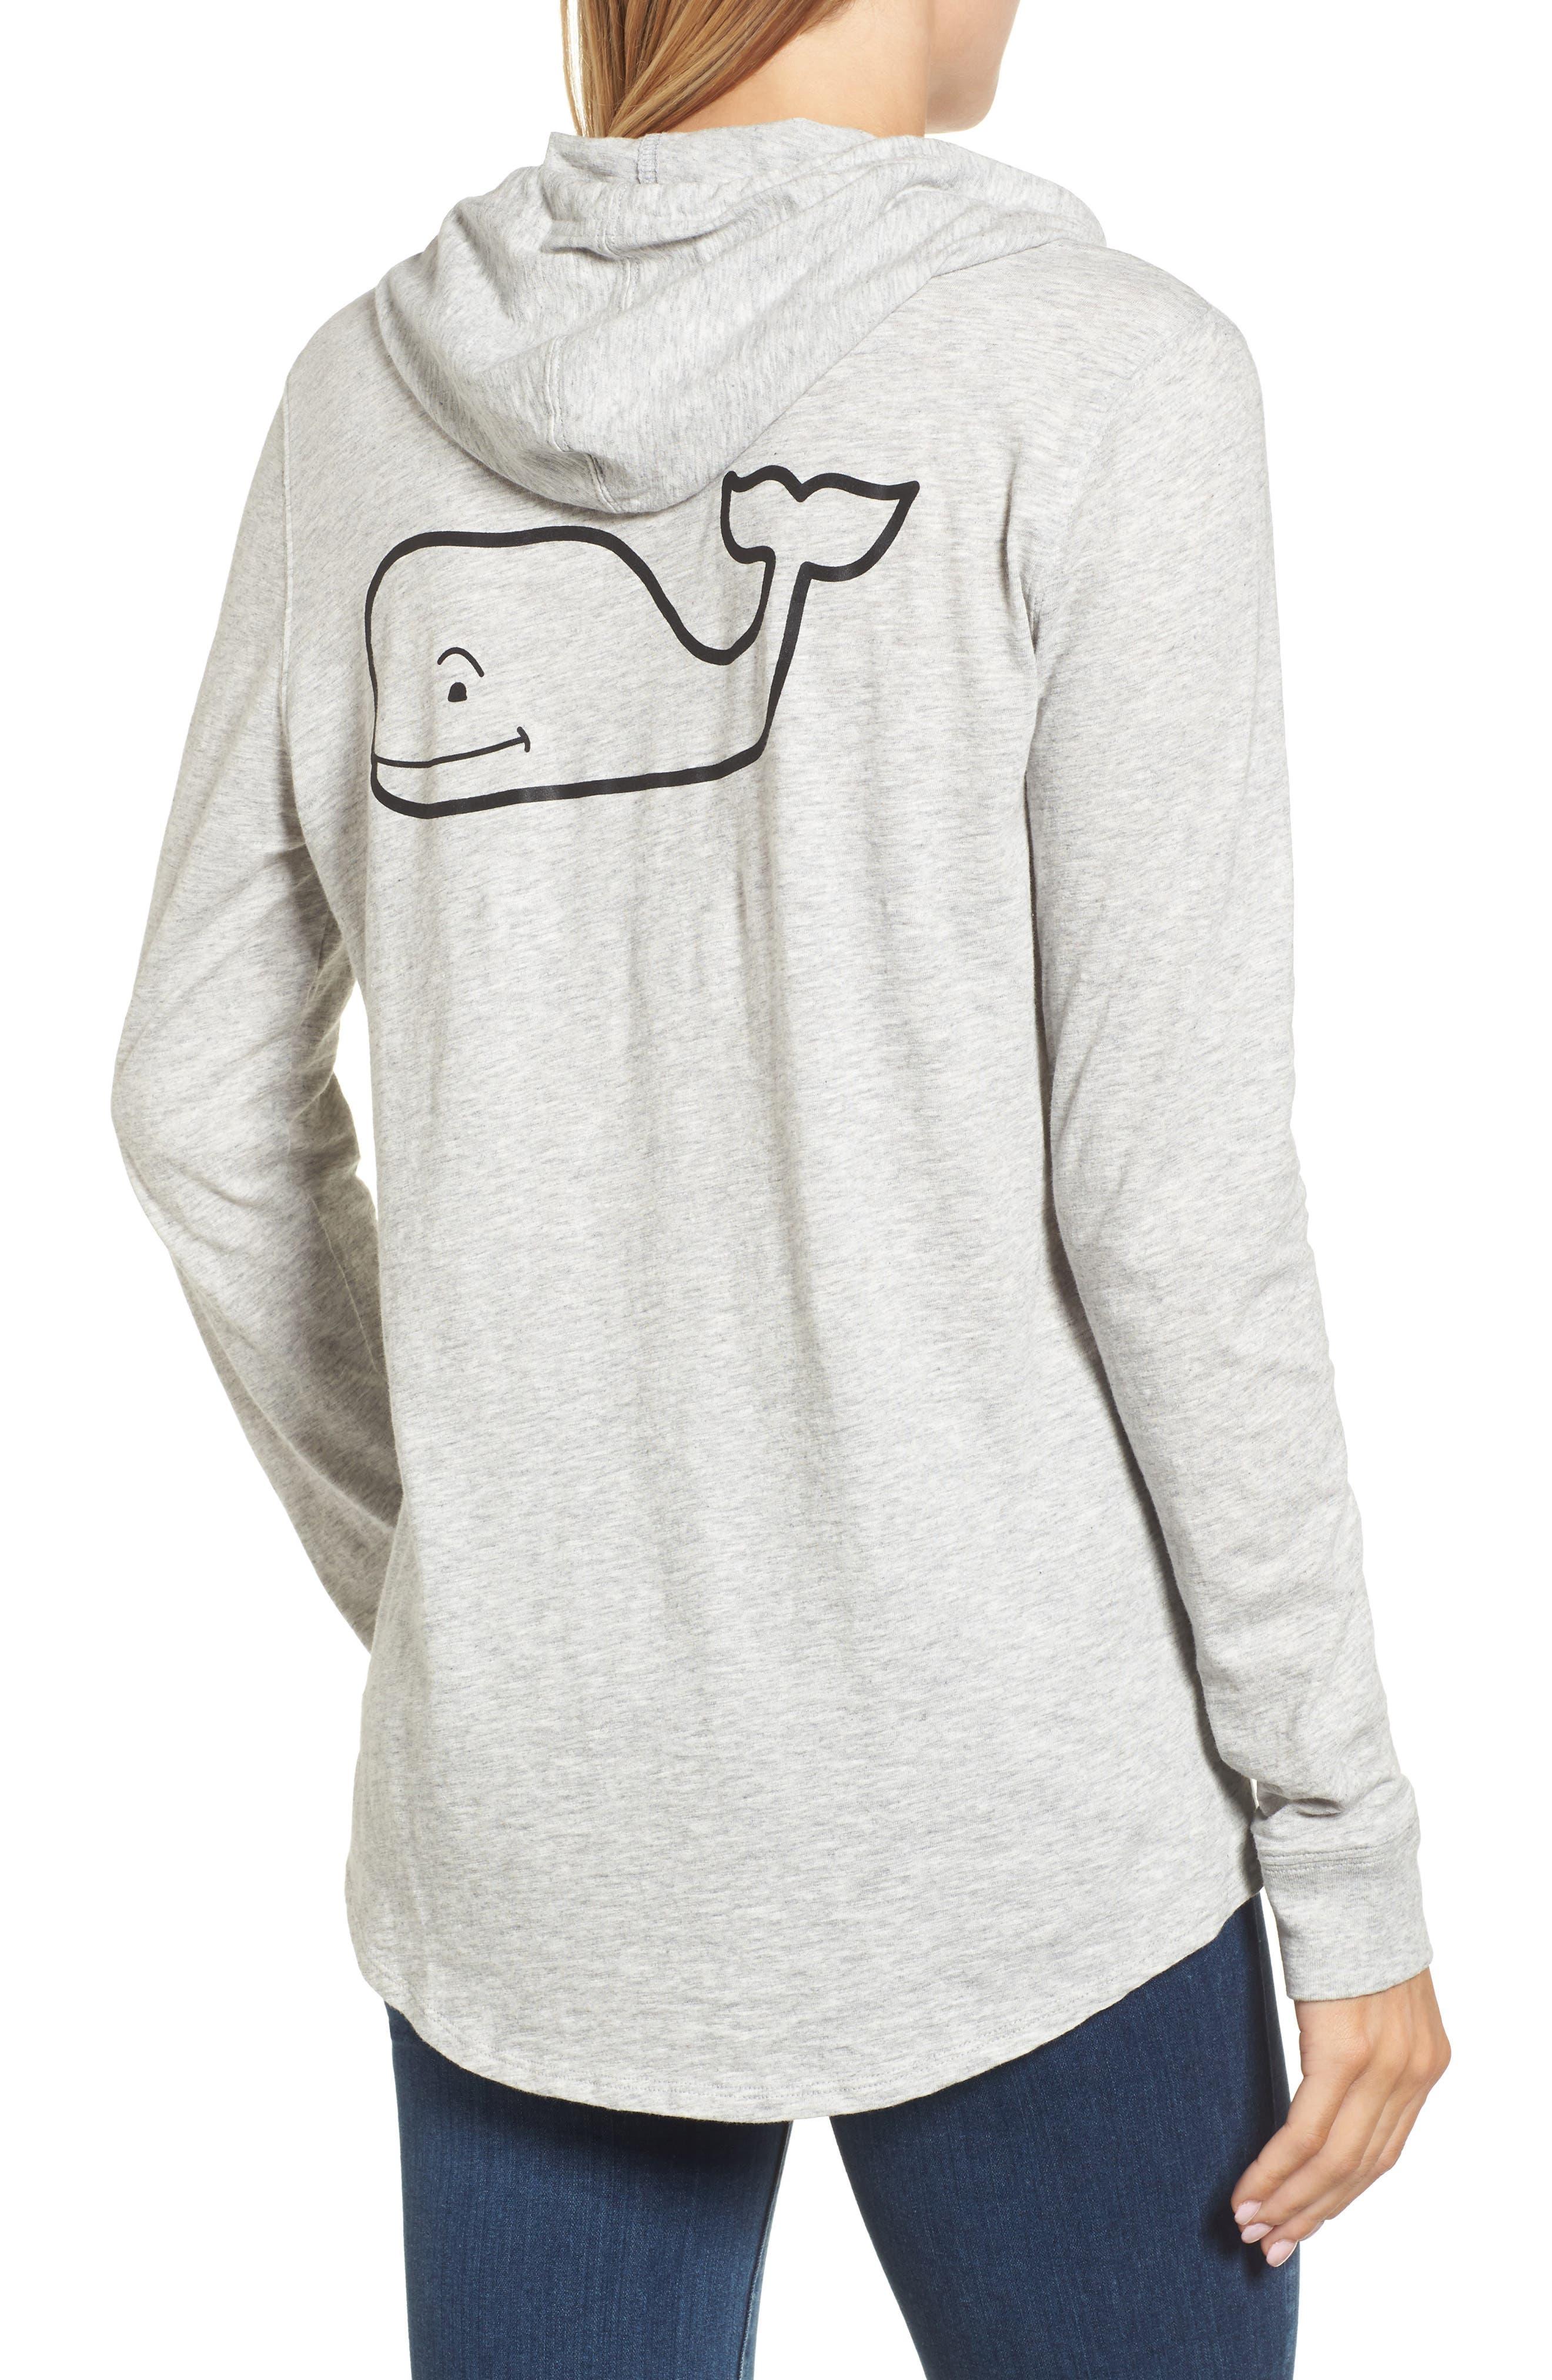 Long Sleeve Slub Whale Hoodie,                             Alternate thumbnail 2, color,                             063